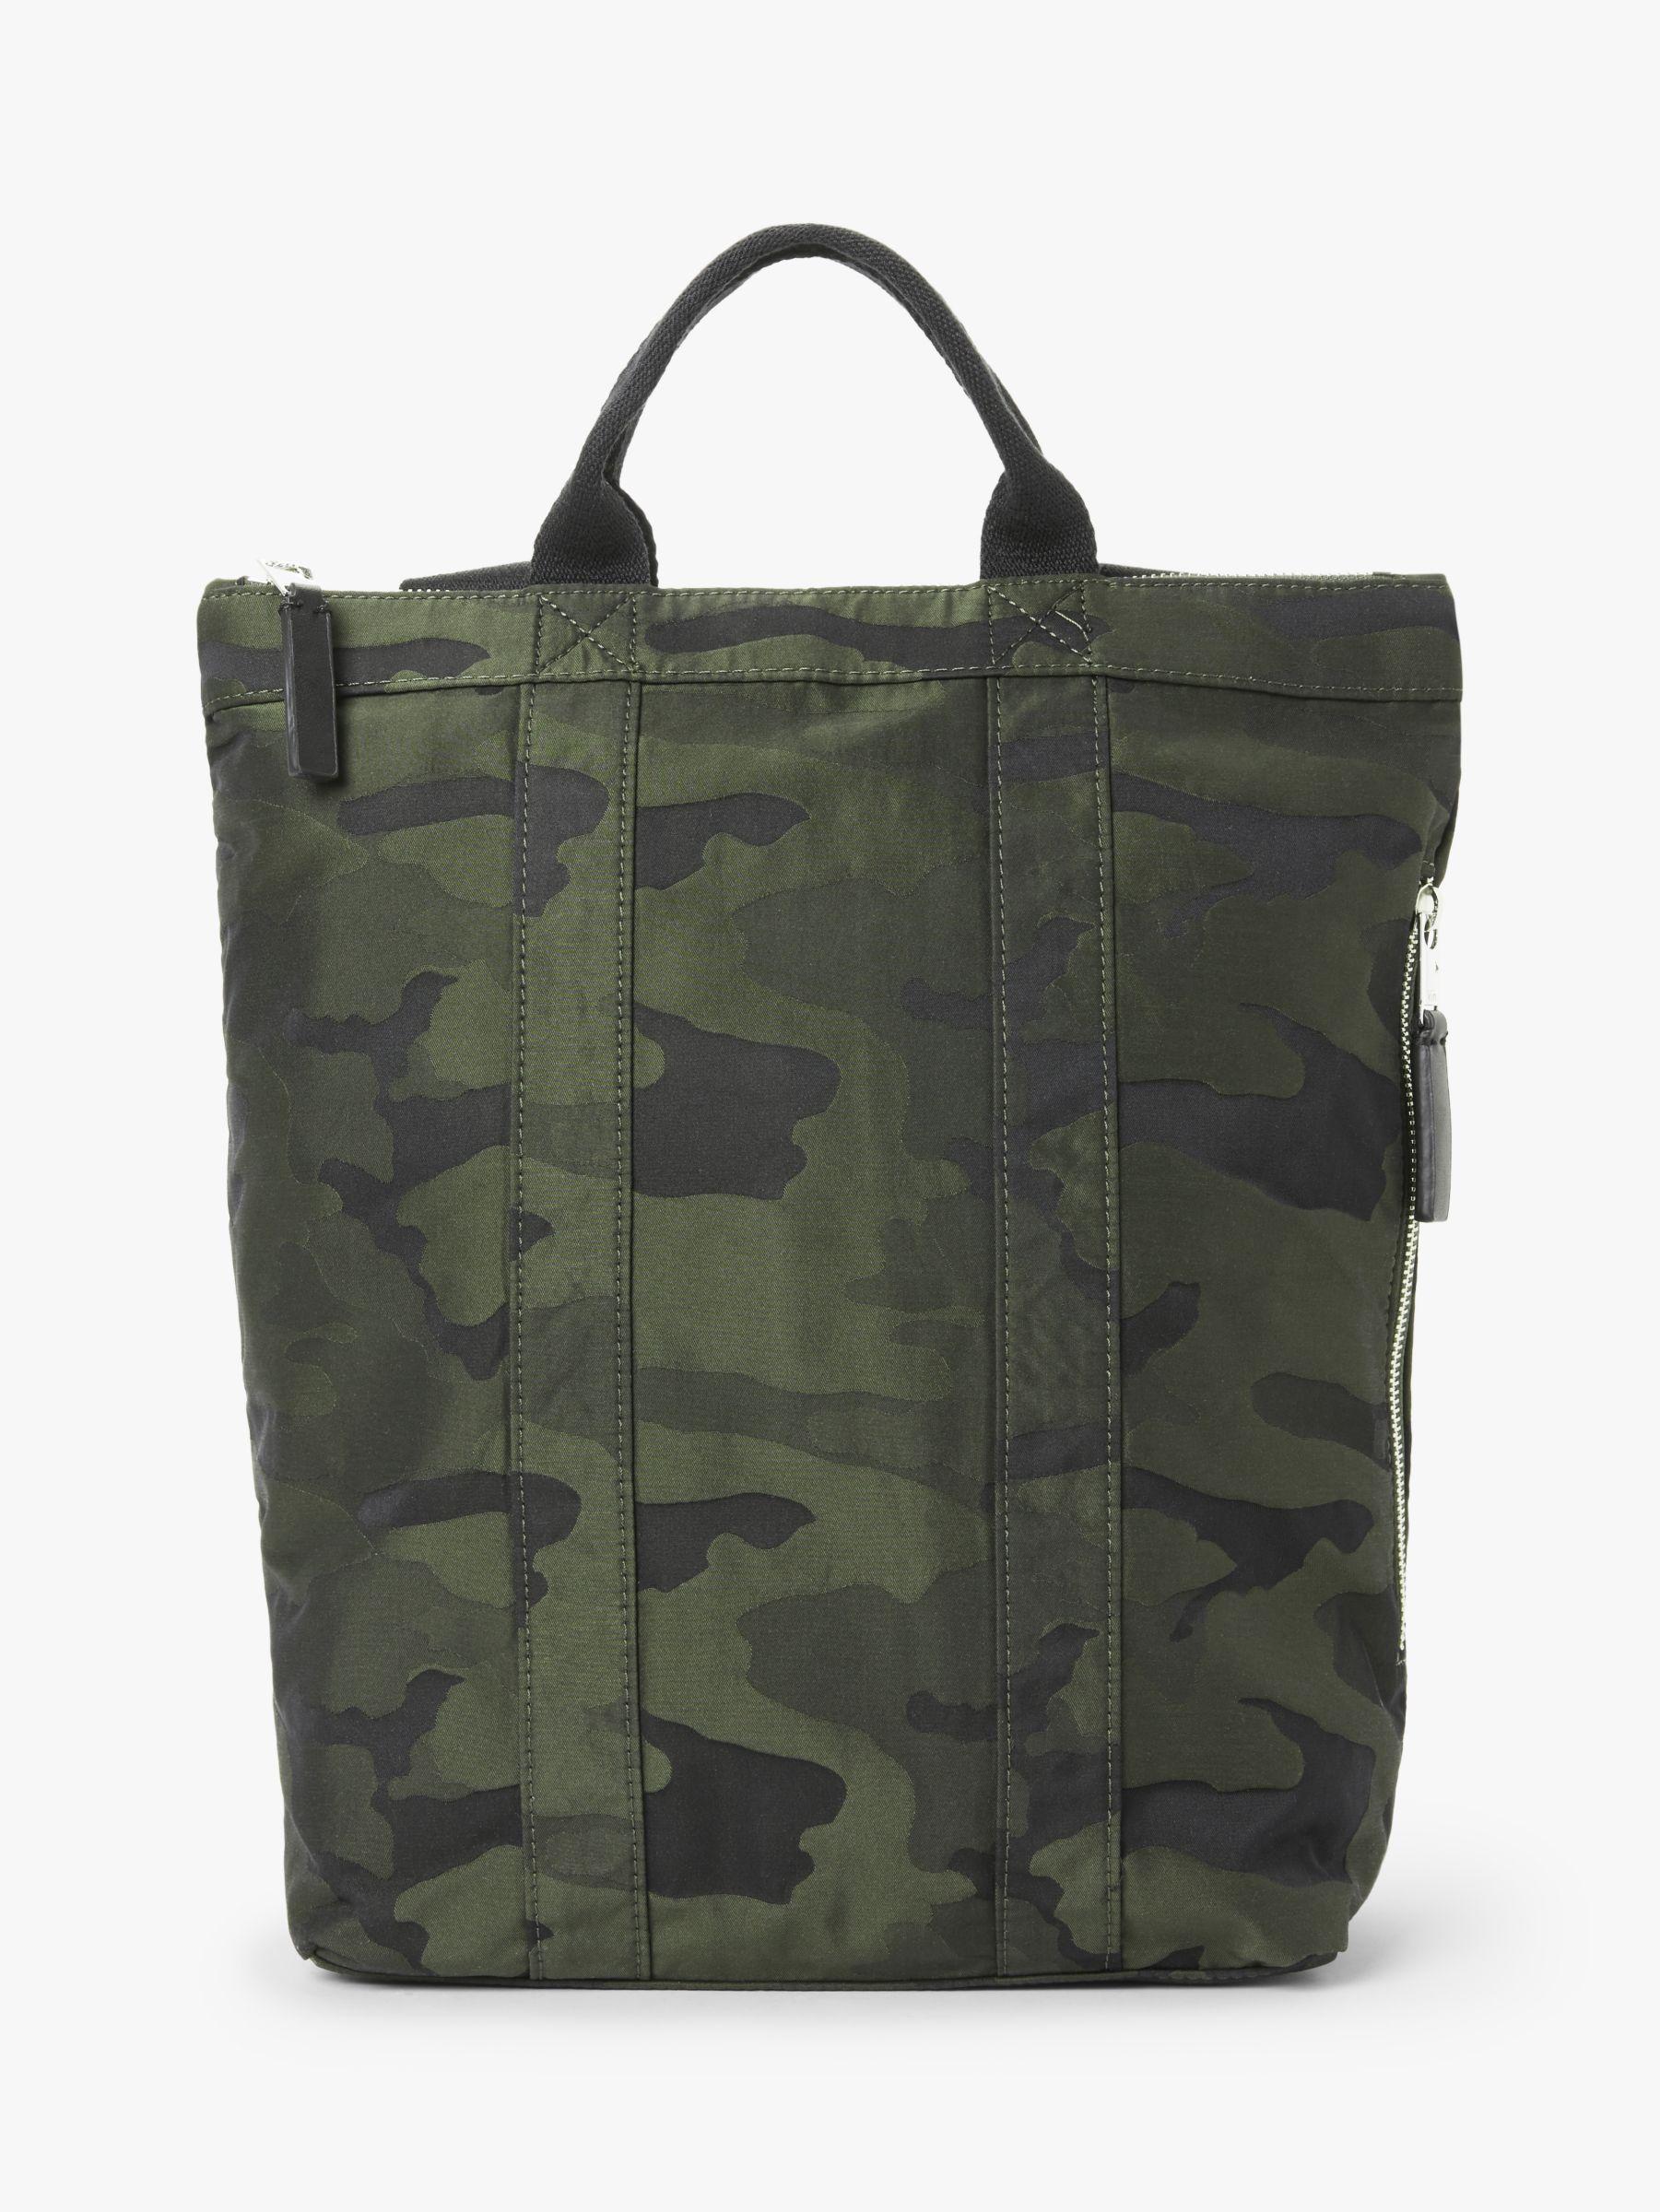 Kin Kin Sette Tote Backpack, Camo